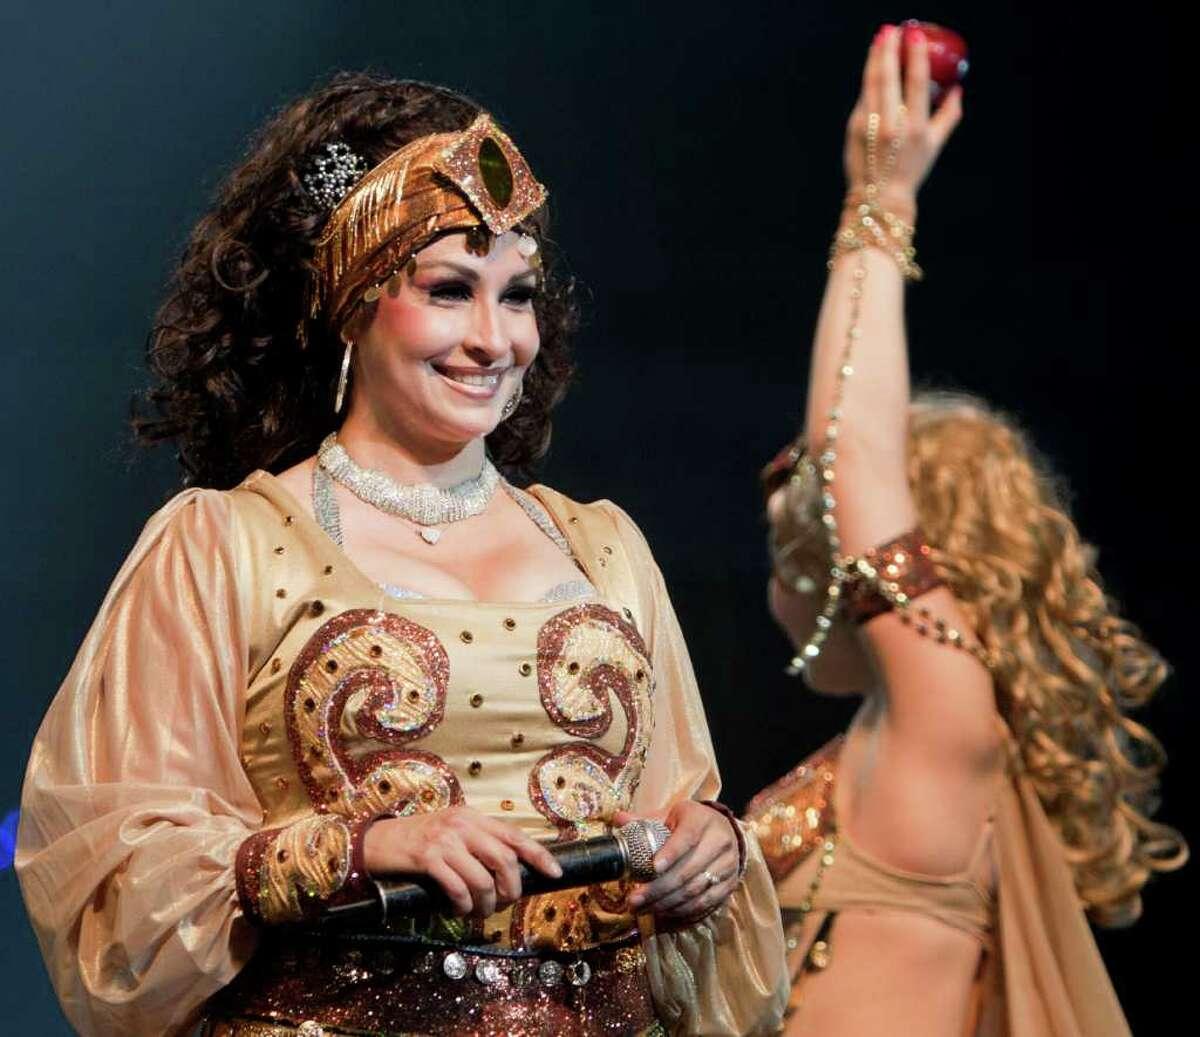 Audrey Alvarado performs as the ringmaster of the Alzafar Shrine Circus at Freeman Coliseum on Thursday, Sept. 8, 2011.